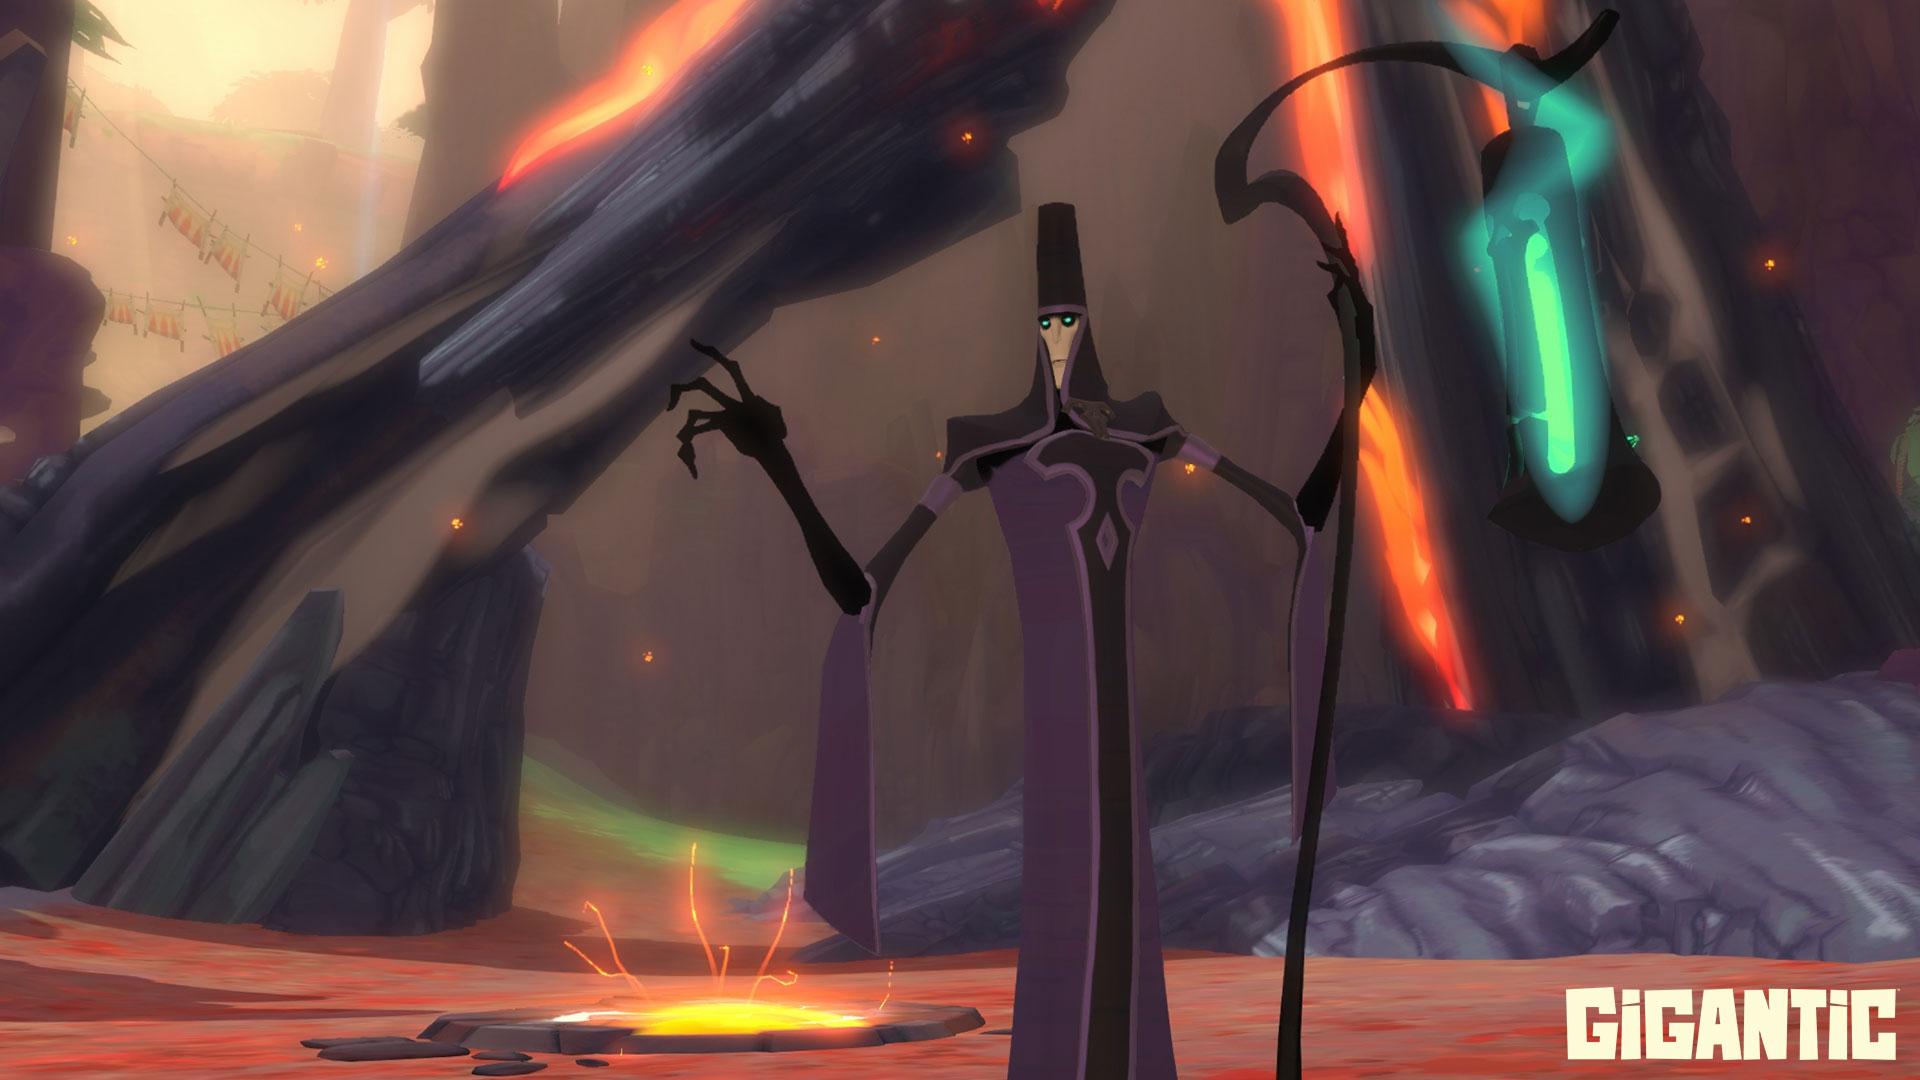 Zu Halloween gibt's in Gigantic fiese Nekromanten & gruselige Wald-Map